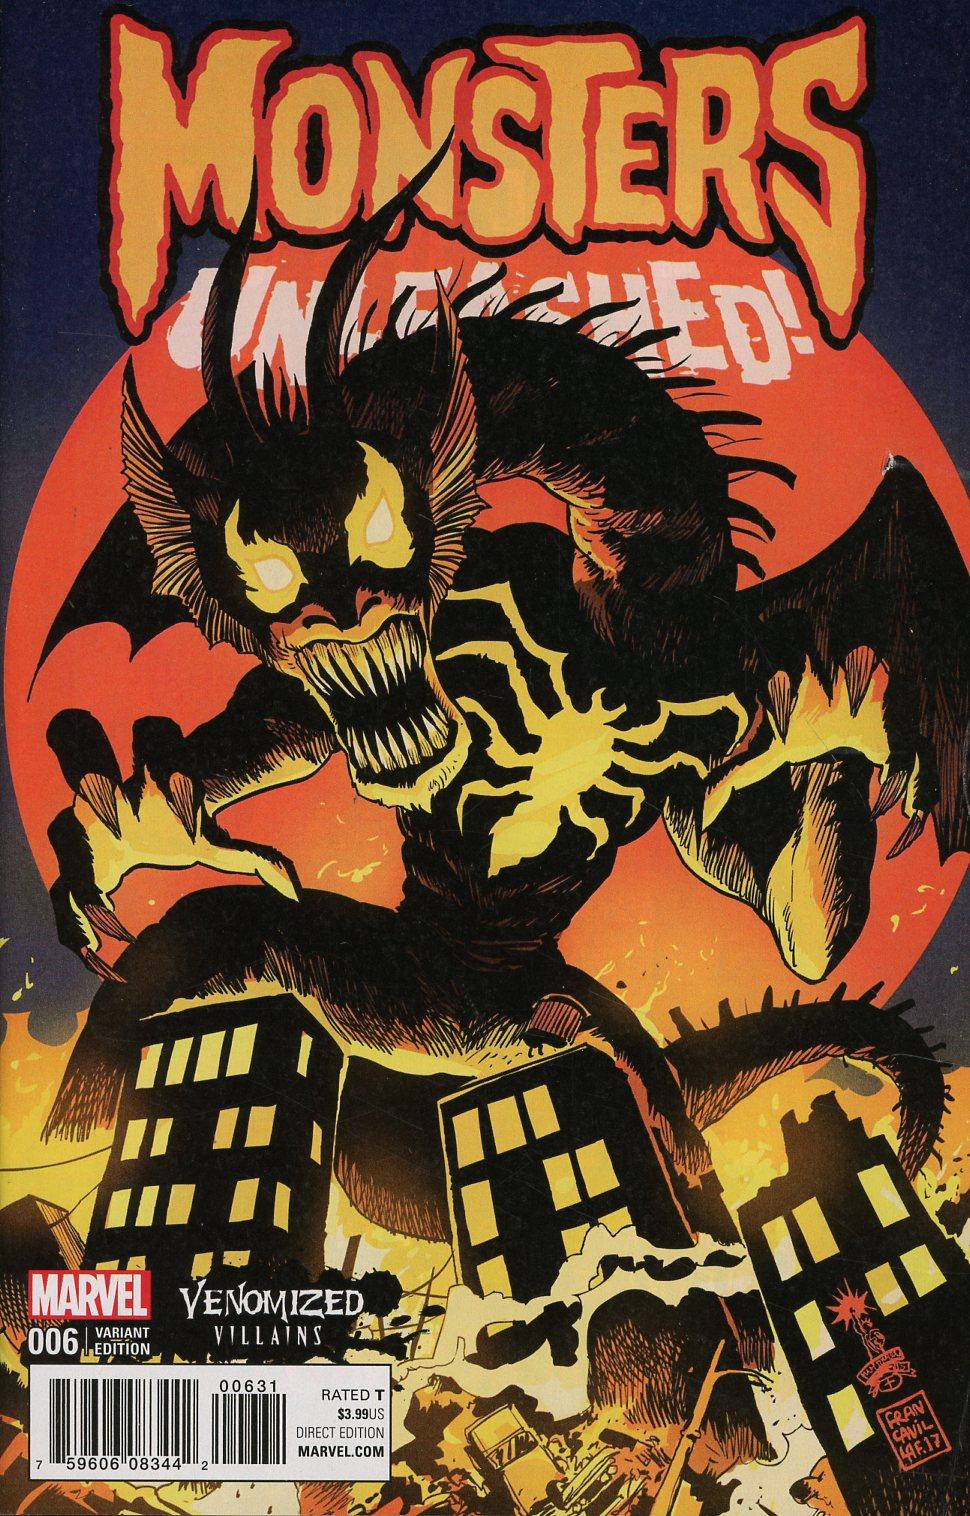 Monsters Unleashed Vol 2 #6 Cover B Variant Francesco Francavilla Venomized Fin Fang Foom Cover